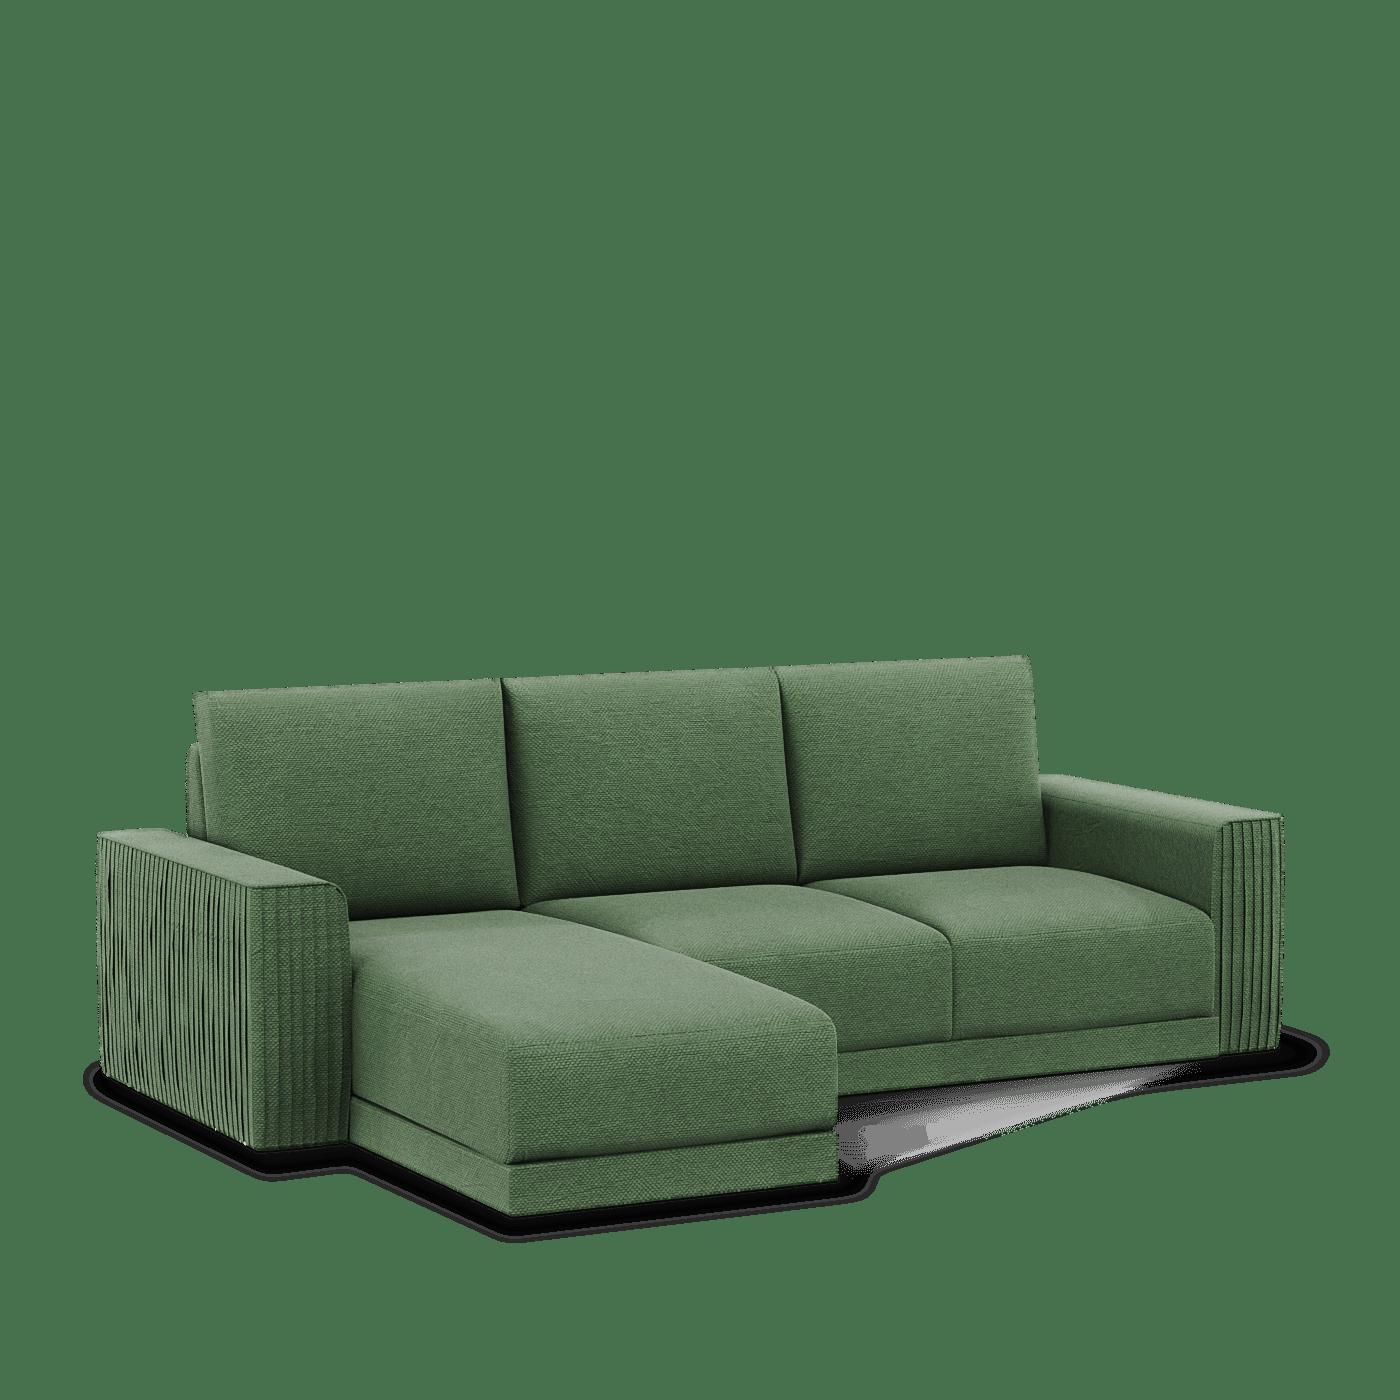 Holf 2 seater sofa + Chaise